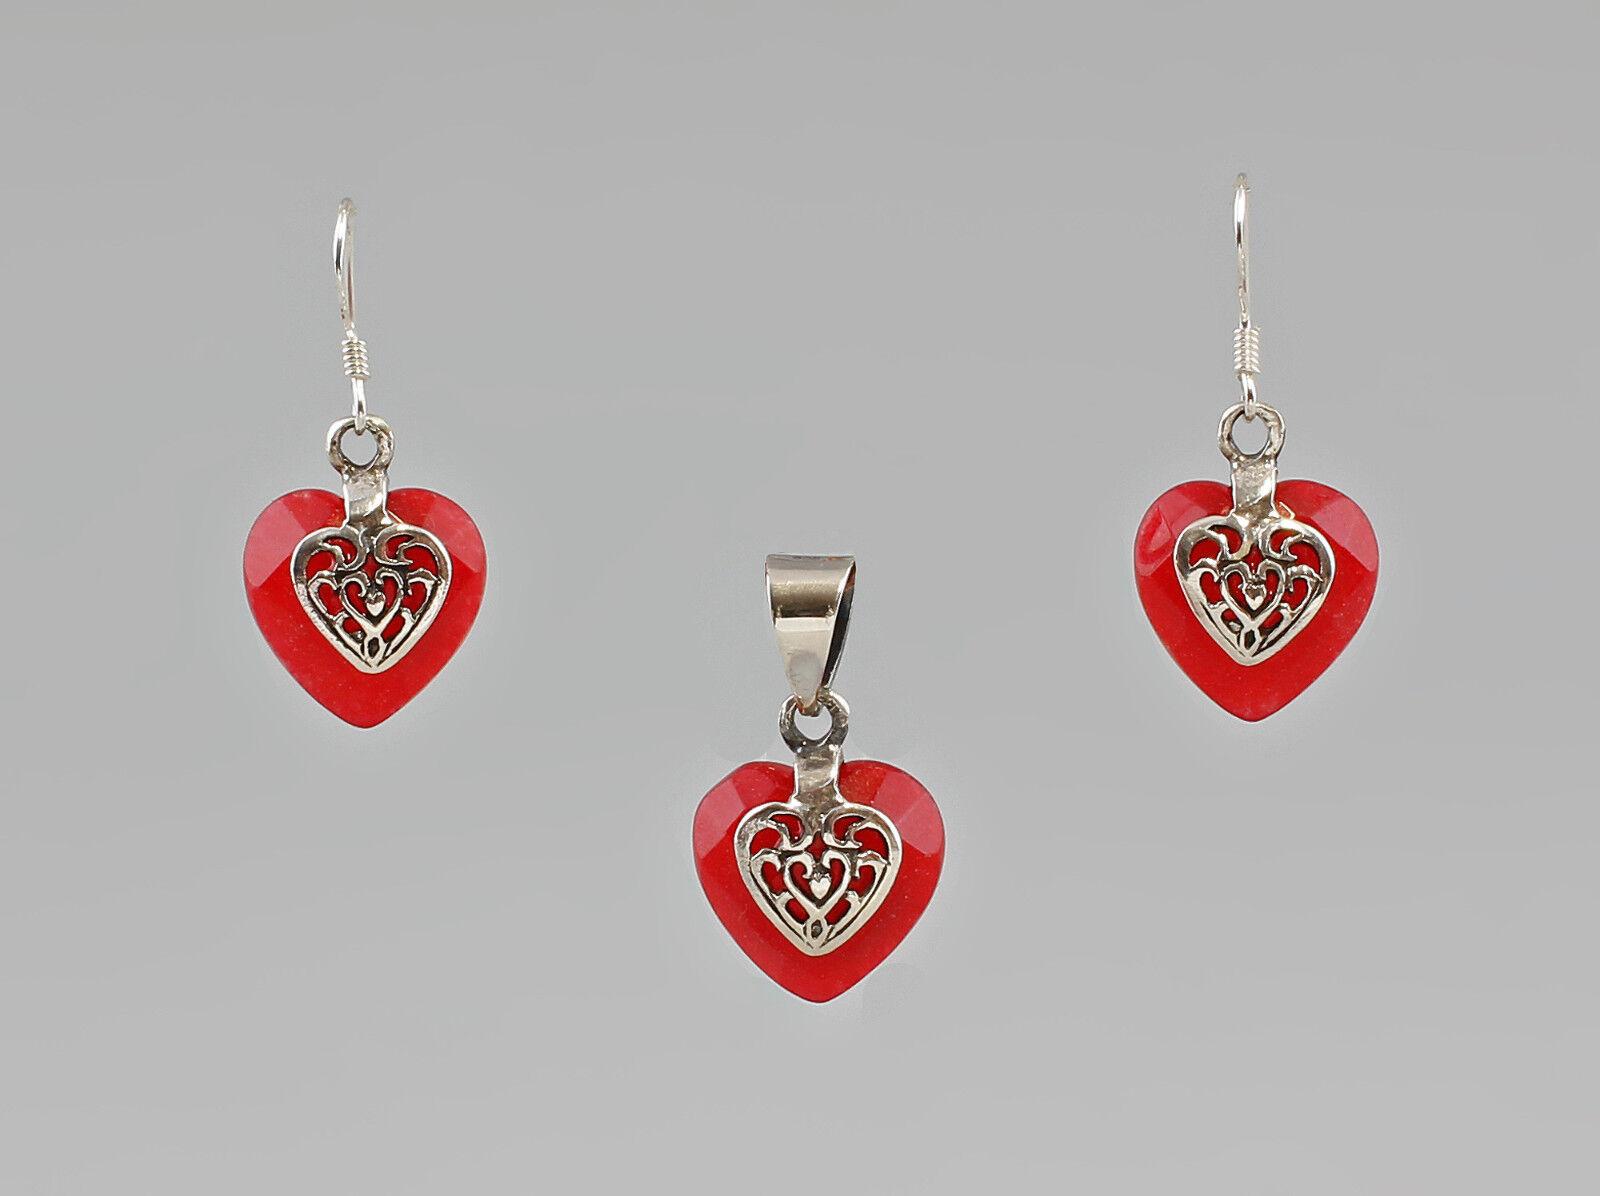 9907297 925 silver garniture pendentif boucles d'oreilles karneol-herzen